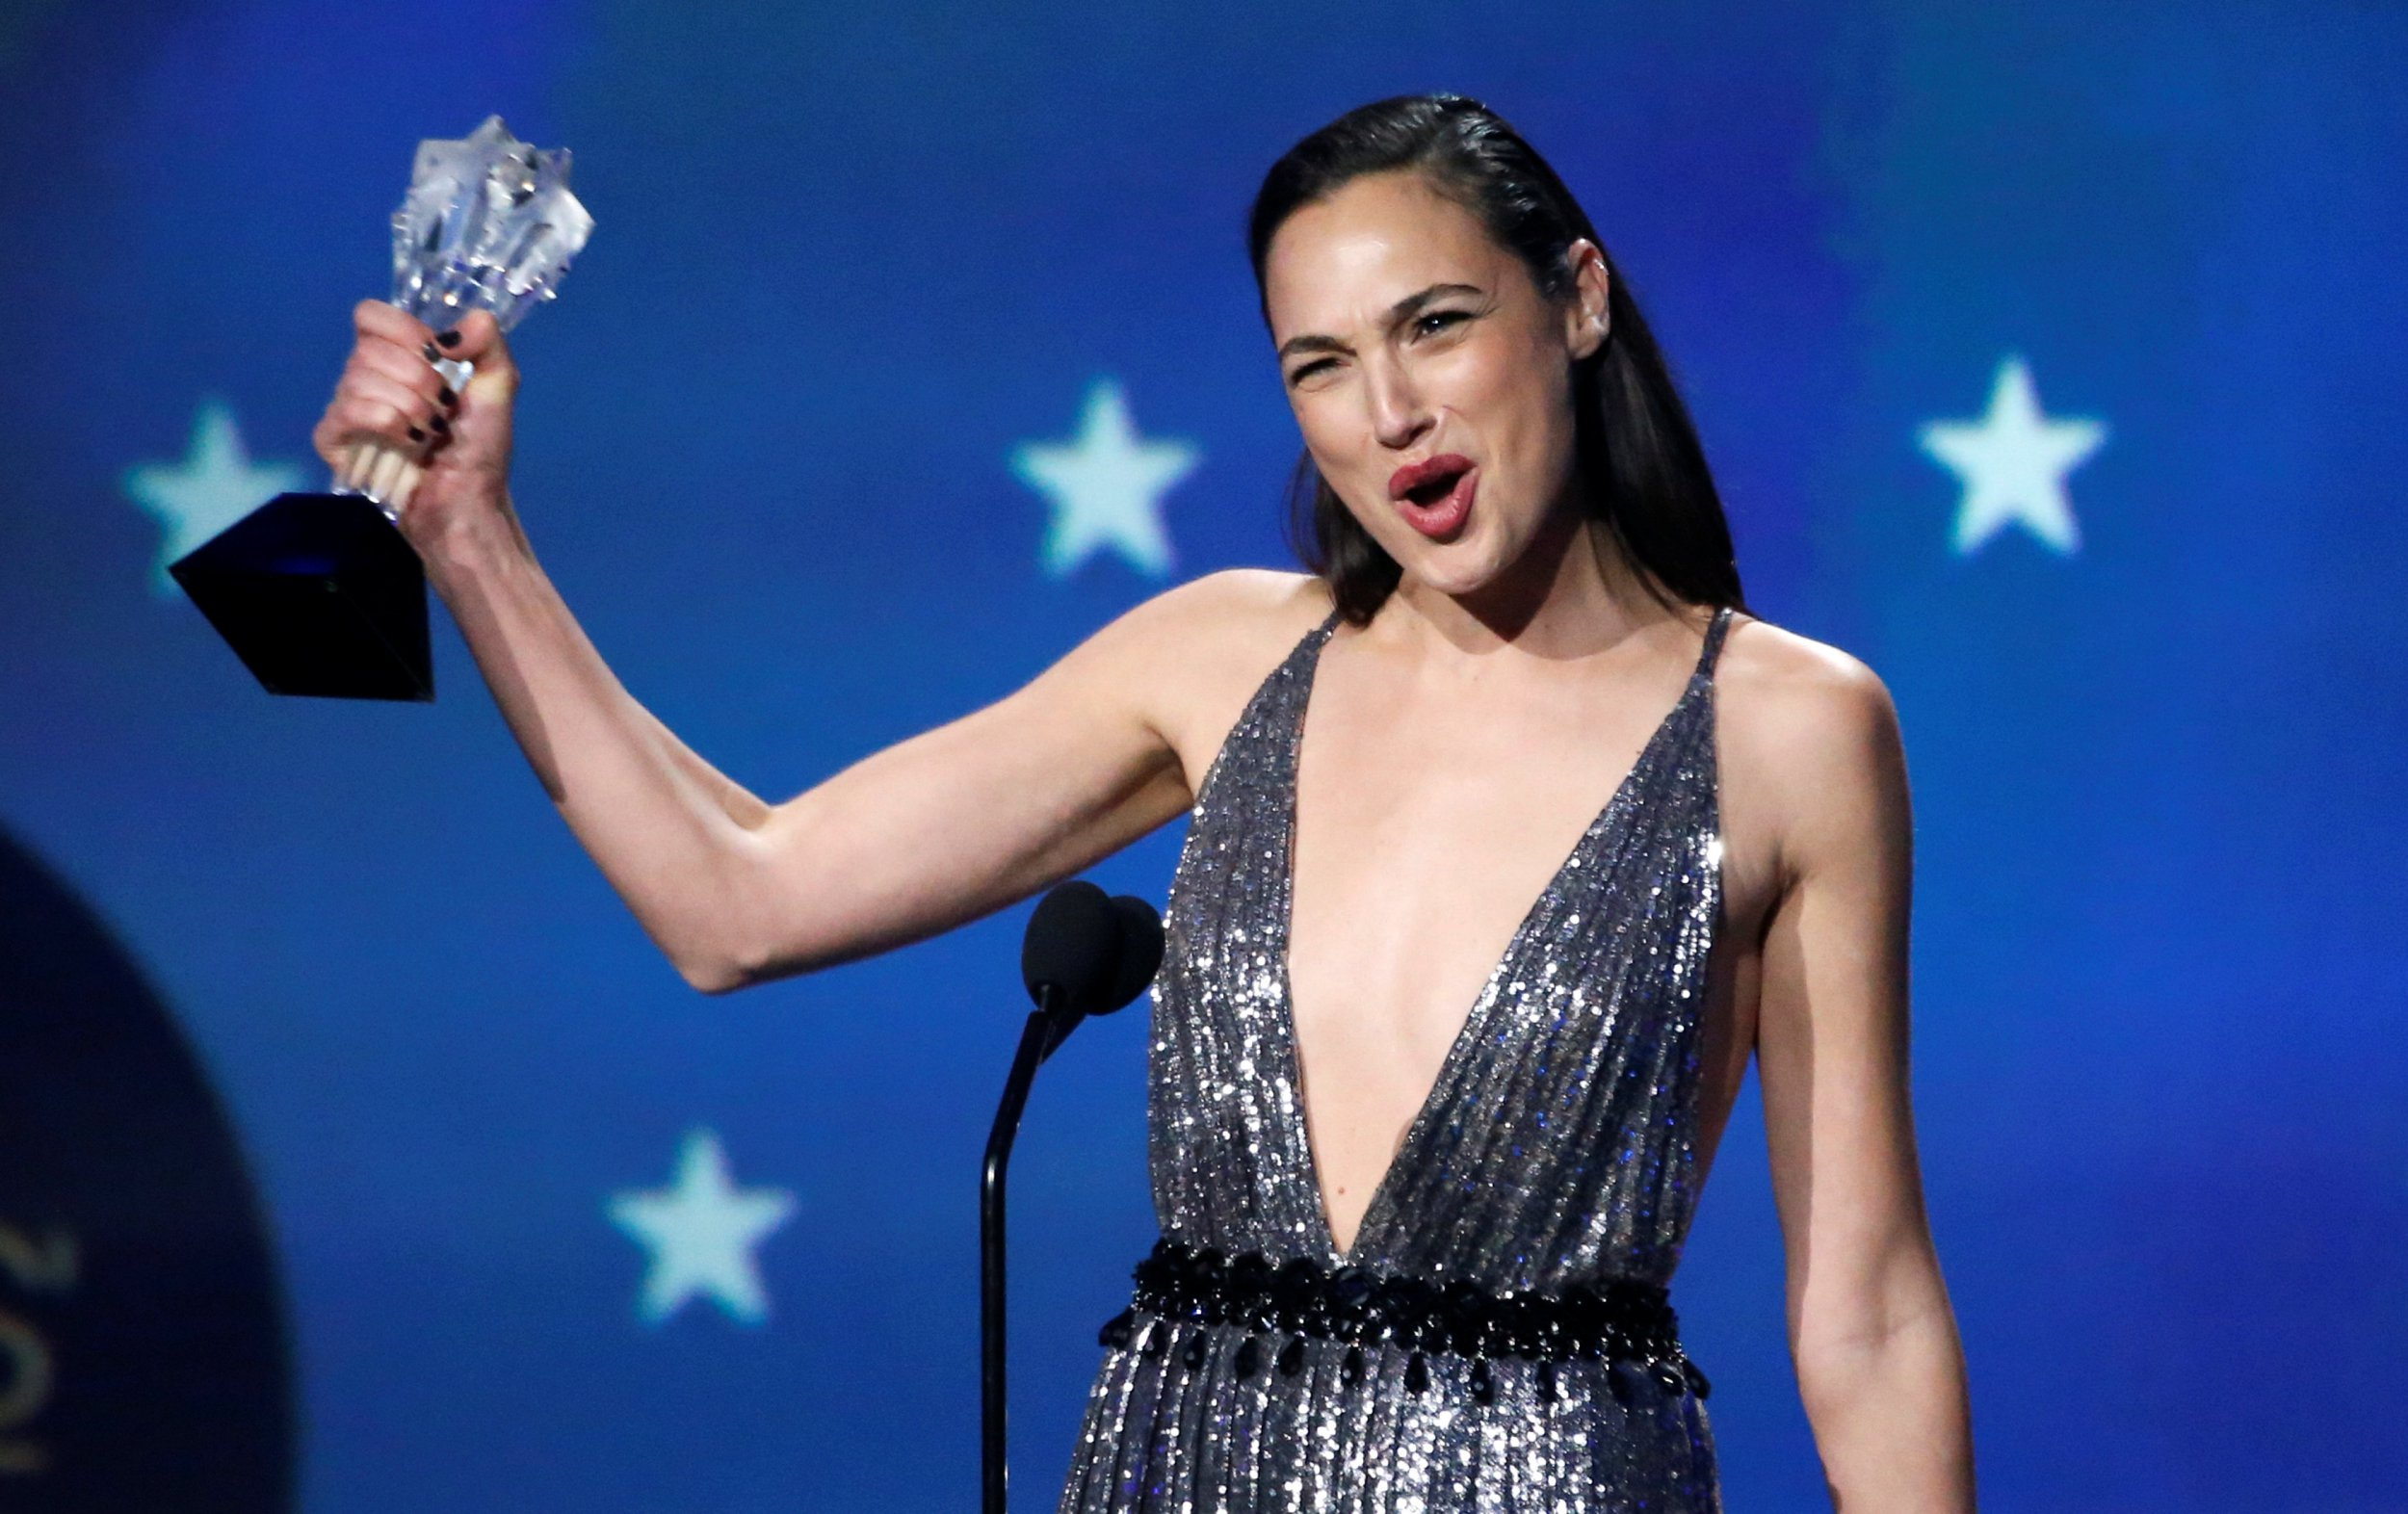 Gal Gadot is a real-life Wonder Woman as she champions women and #MeToo at Critics' Choice Awards